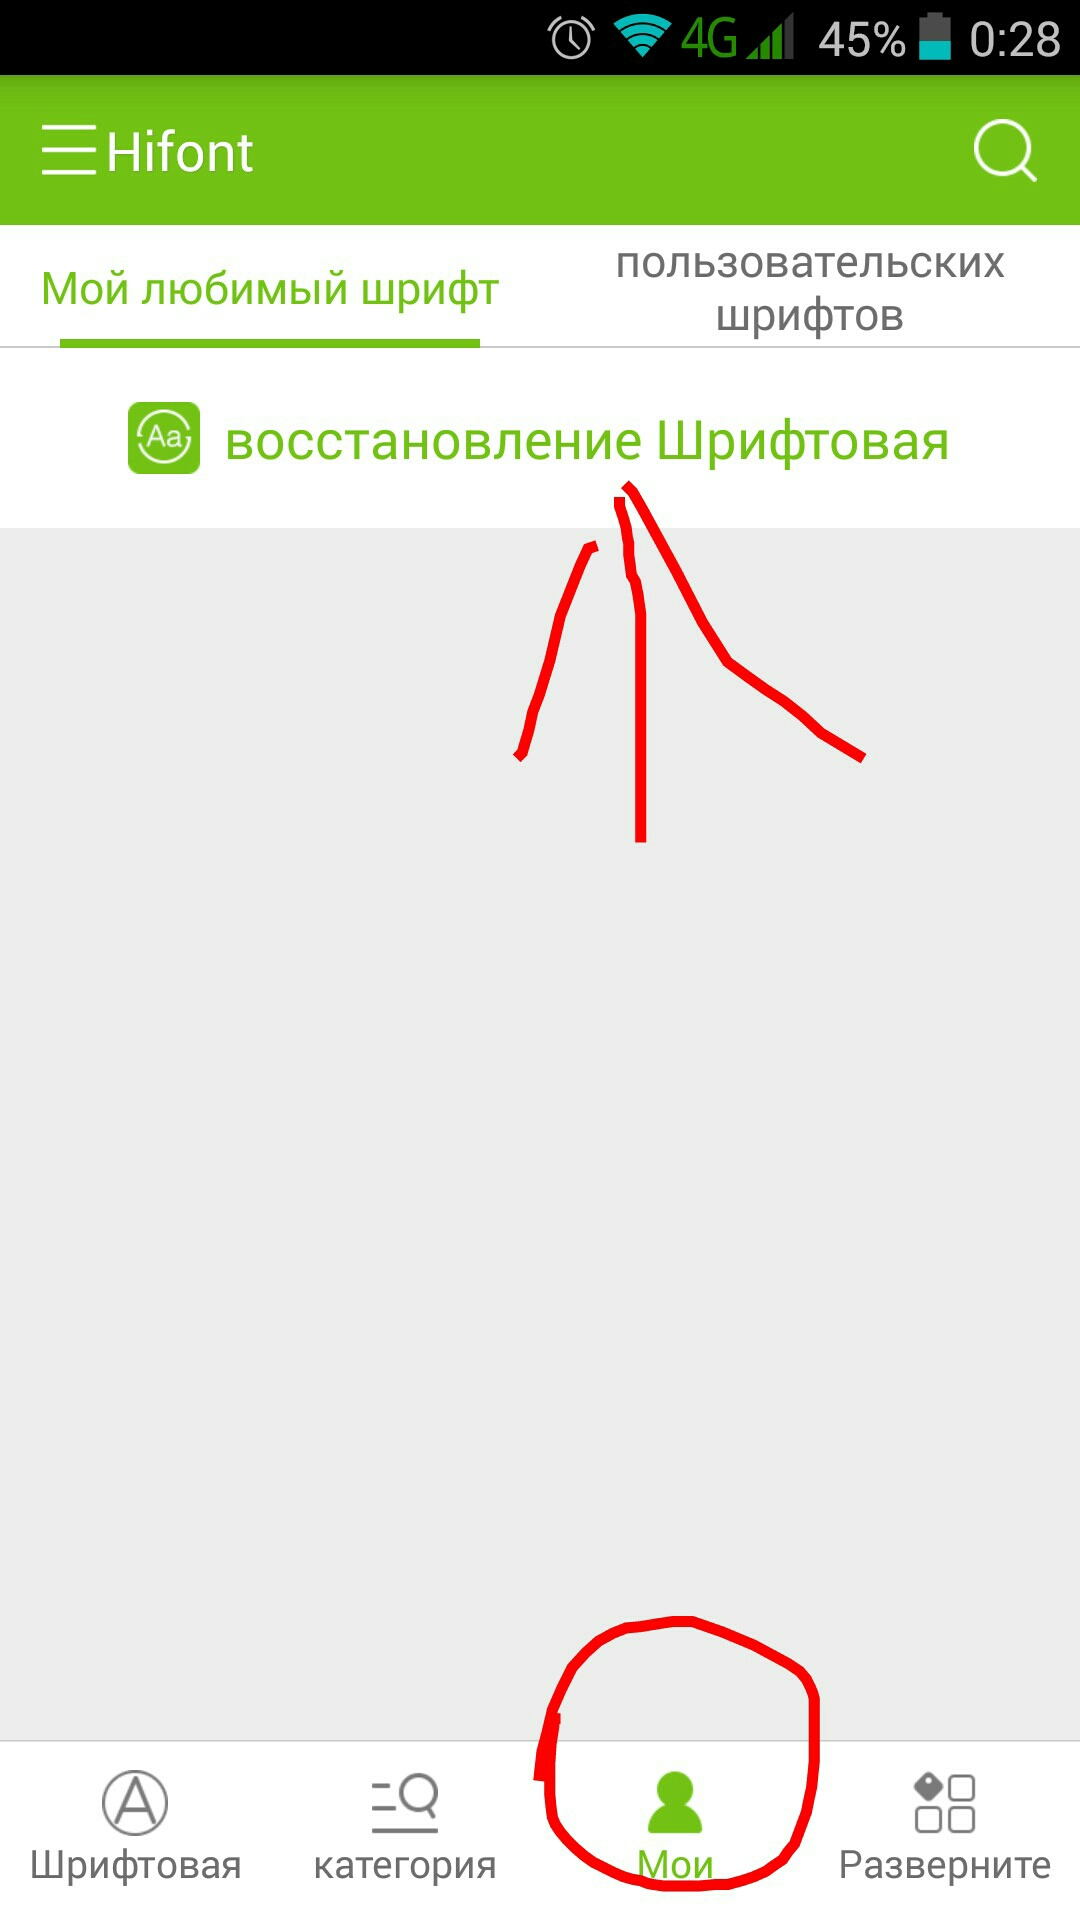 Как удалить андроид 4.4